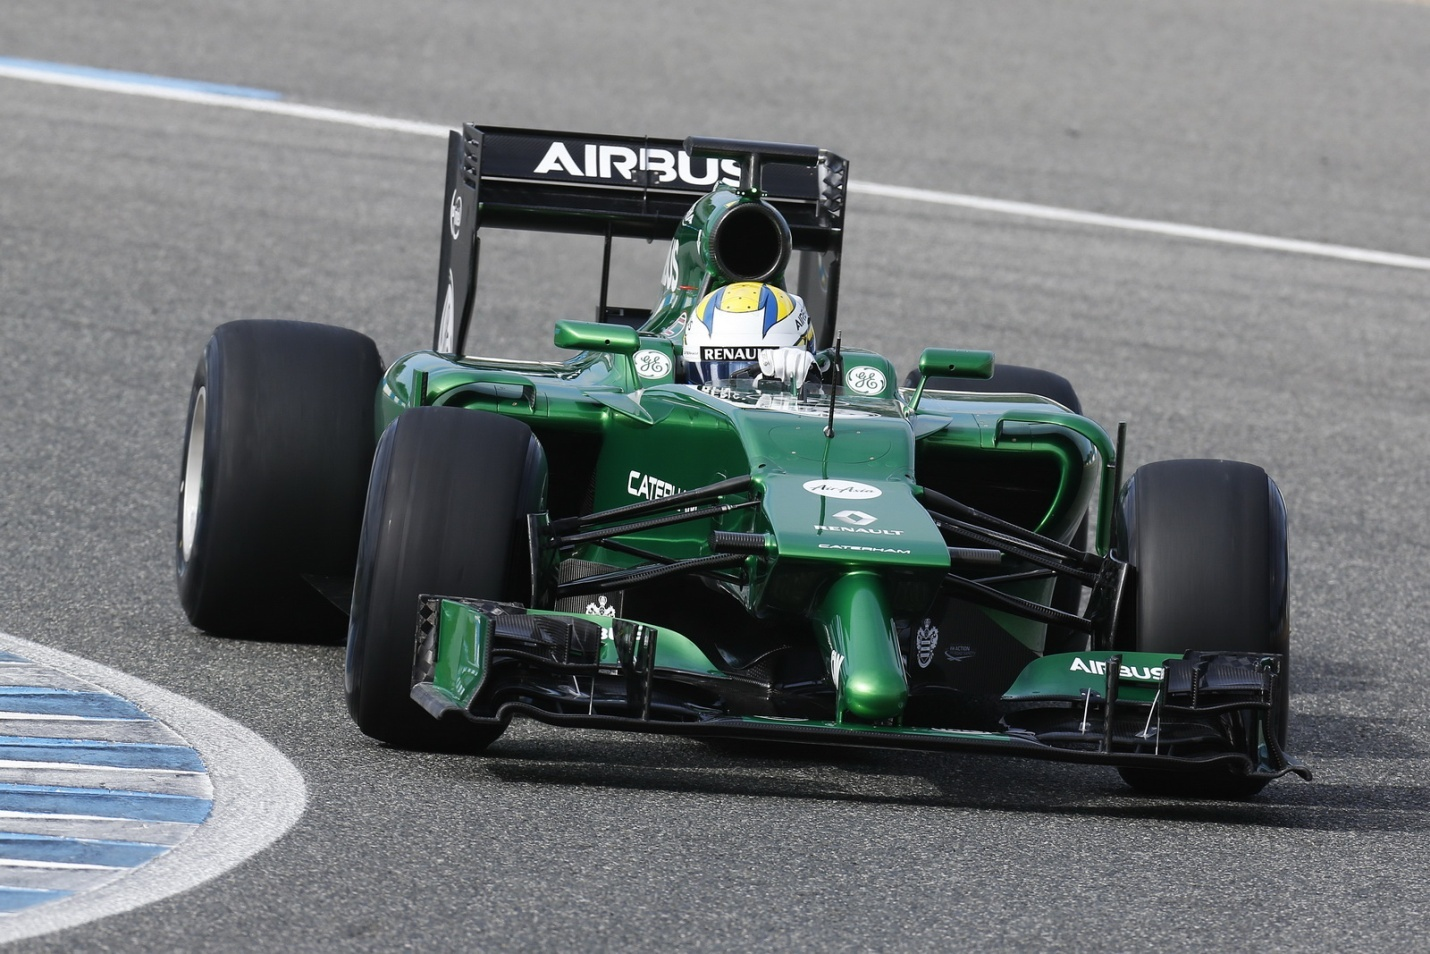 Marcus Ericsson racing